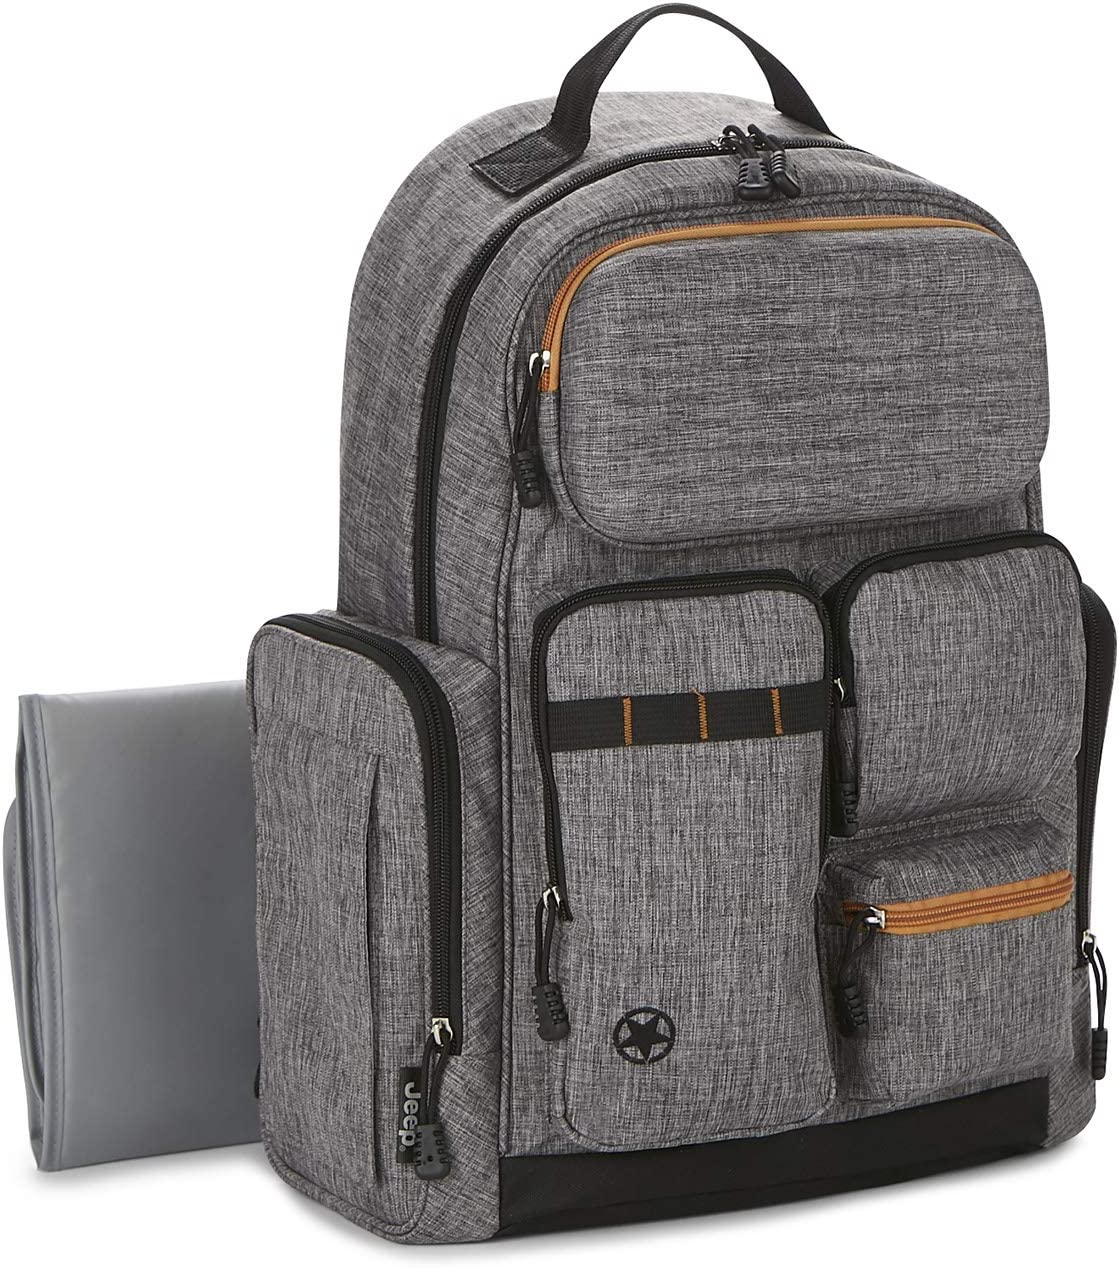 Jeep Adventurers Backpack Diaper Bag Grey//orange